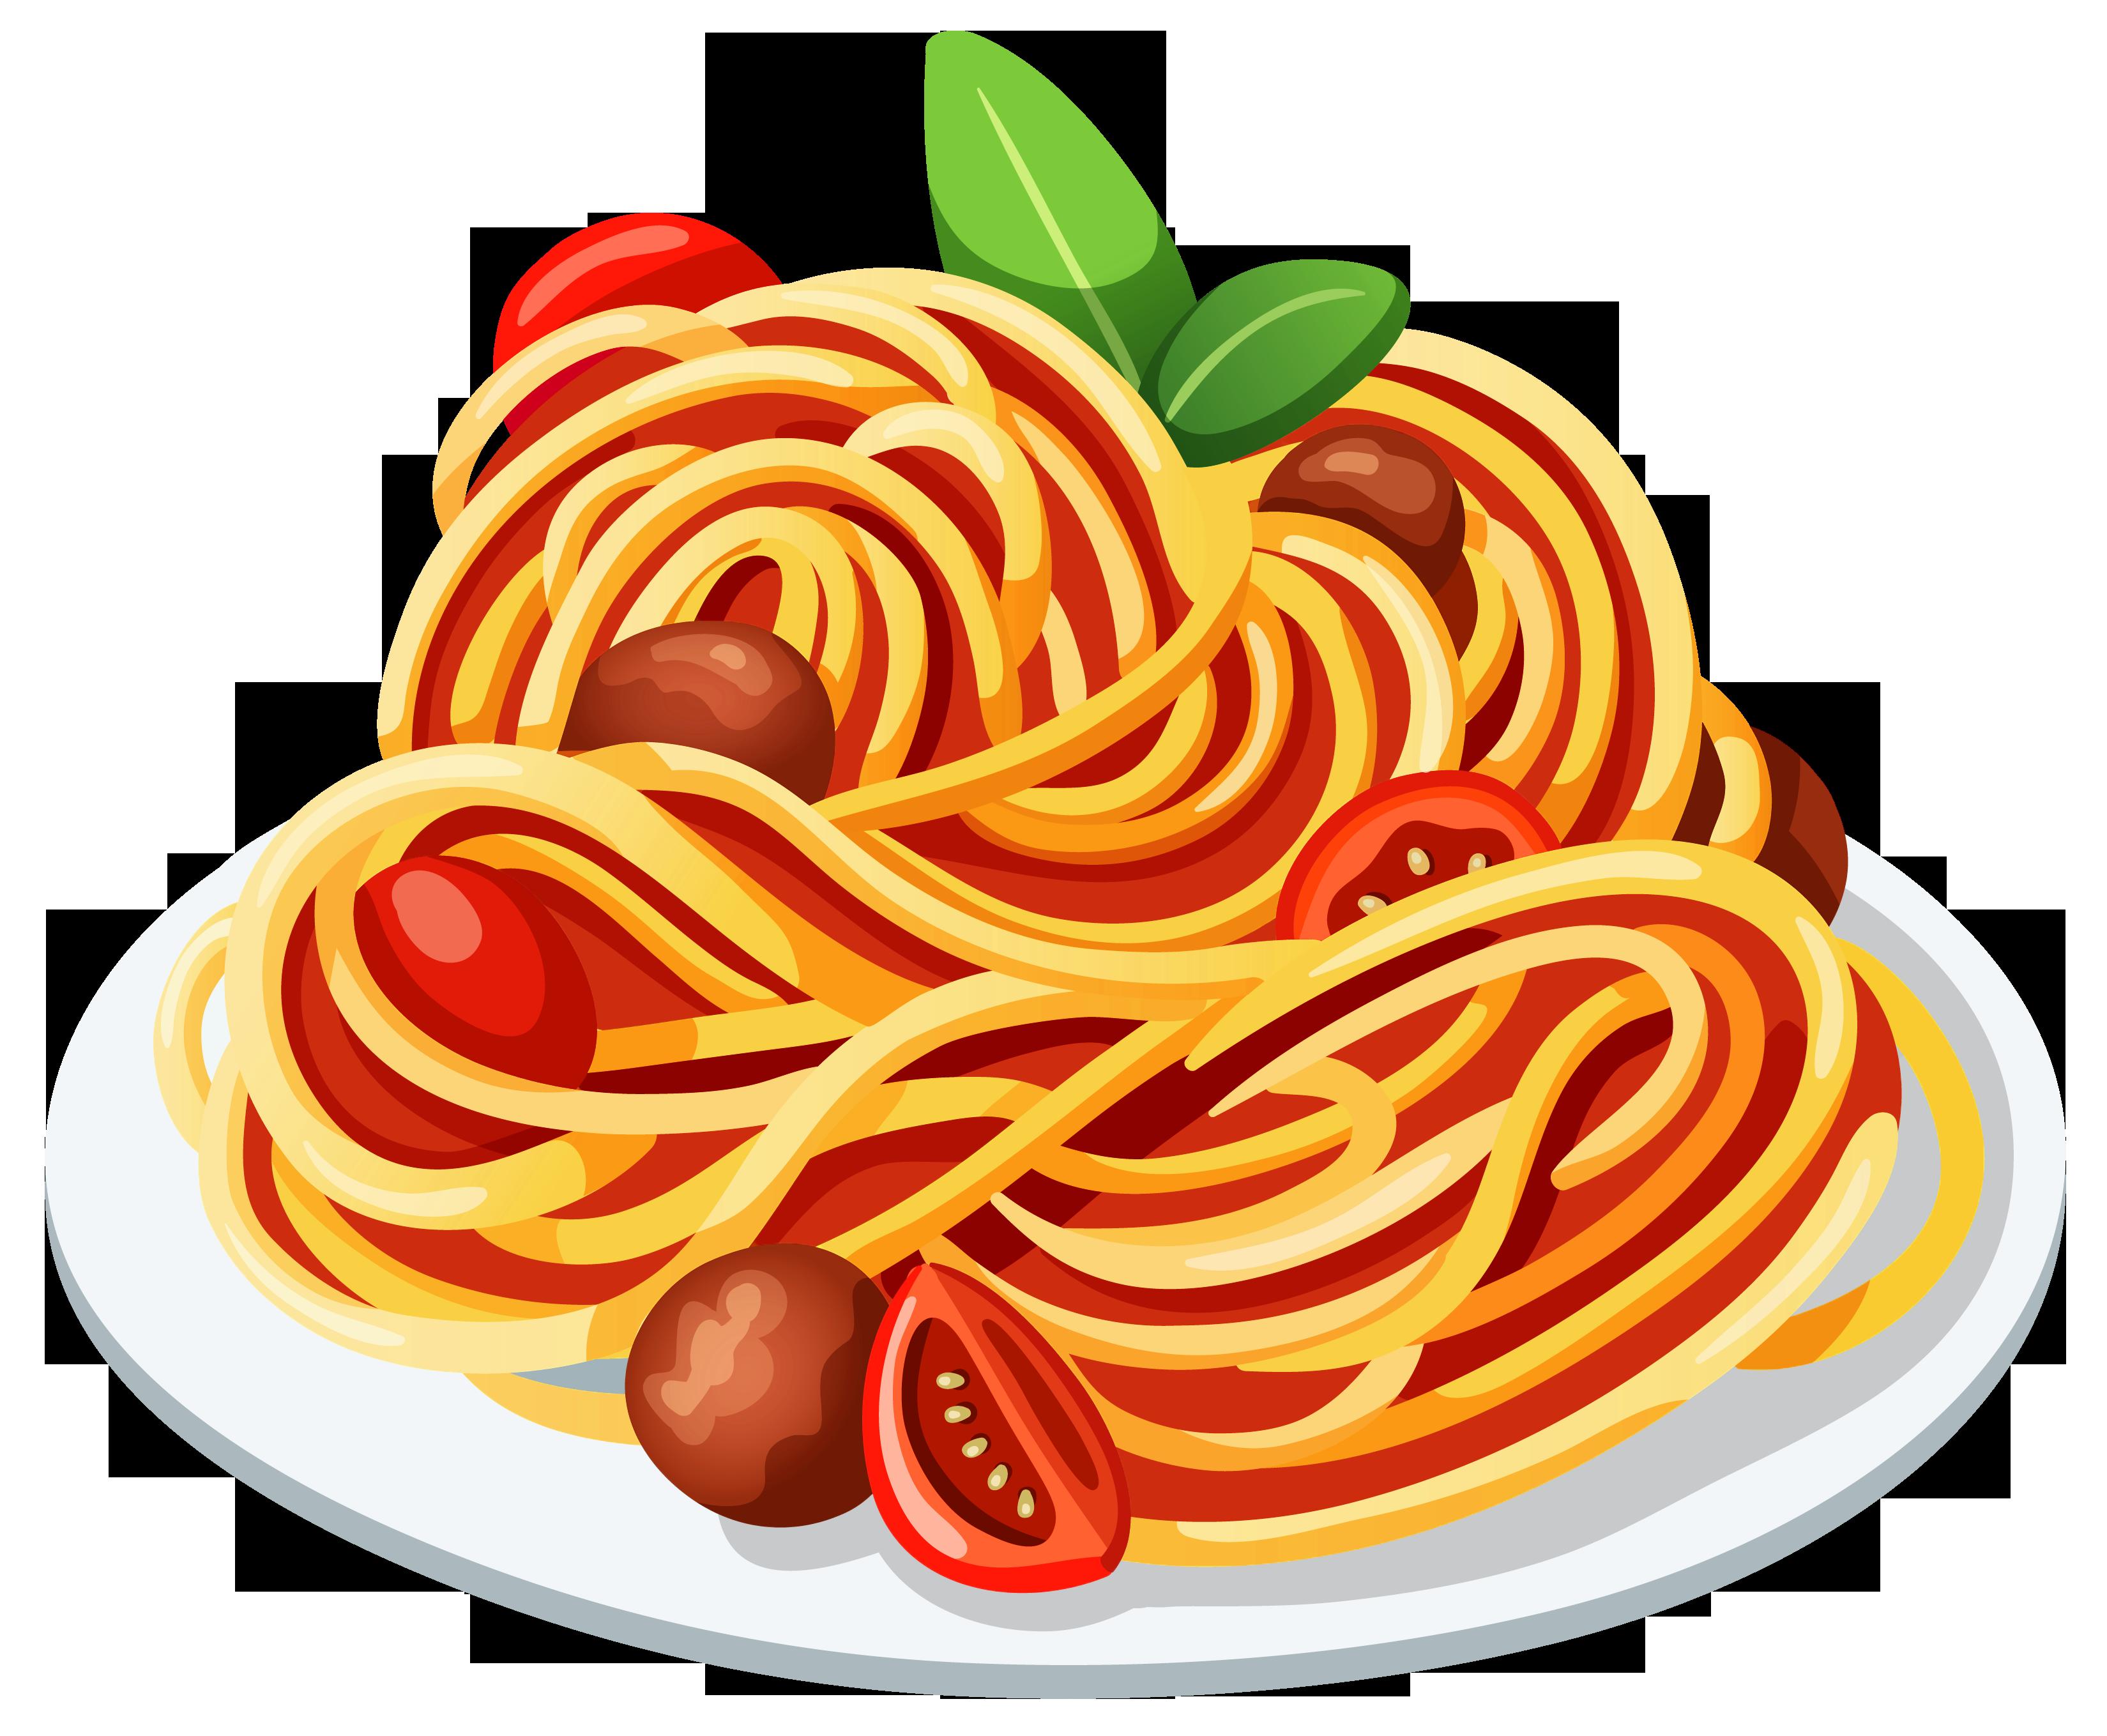 Pasta Spaghetti Ravioli Italian cuisine Clip art.